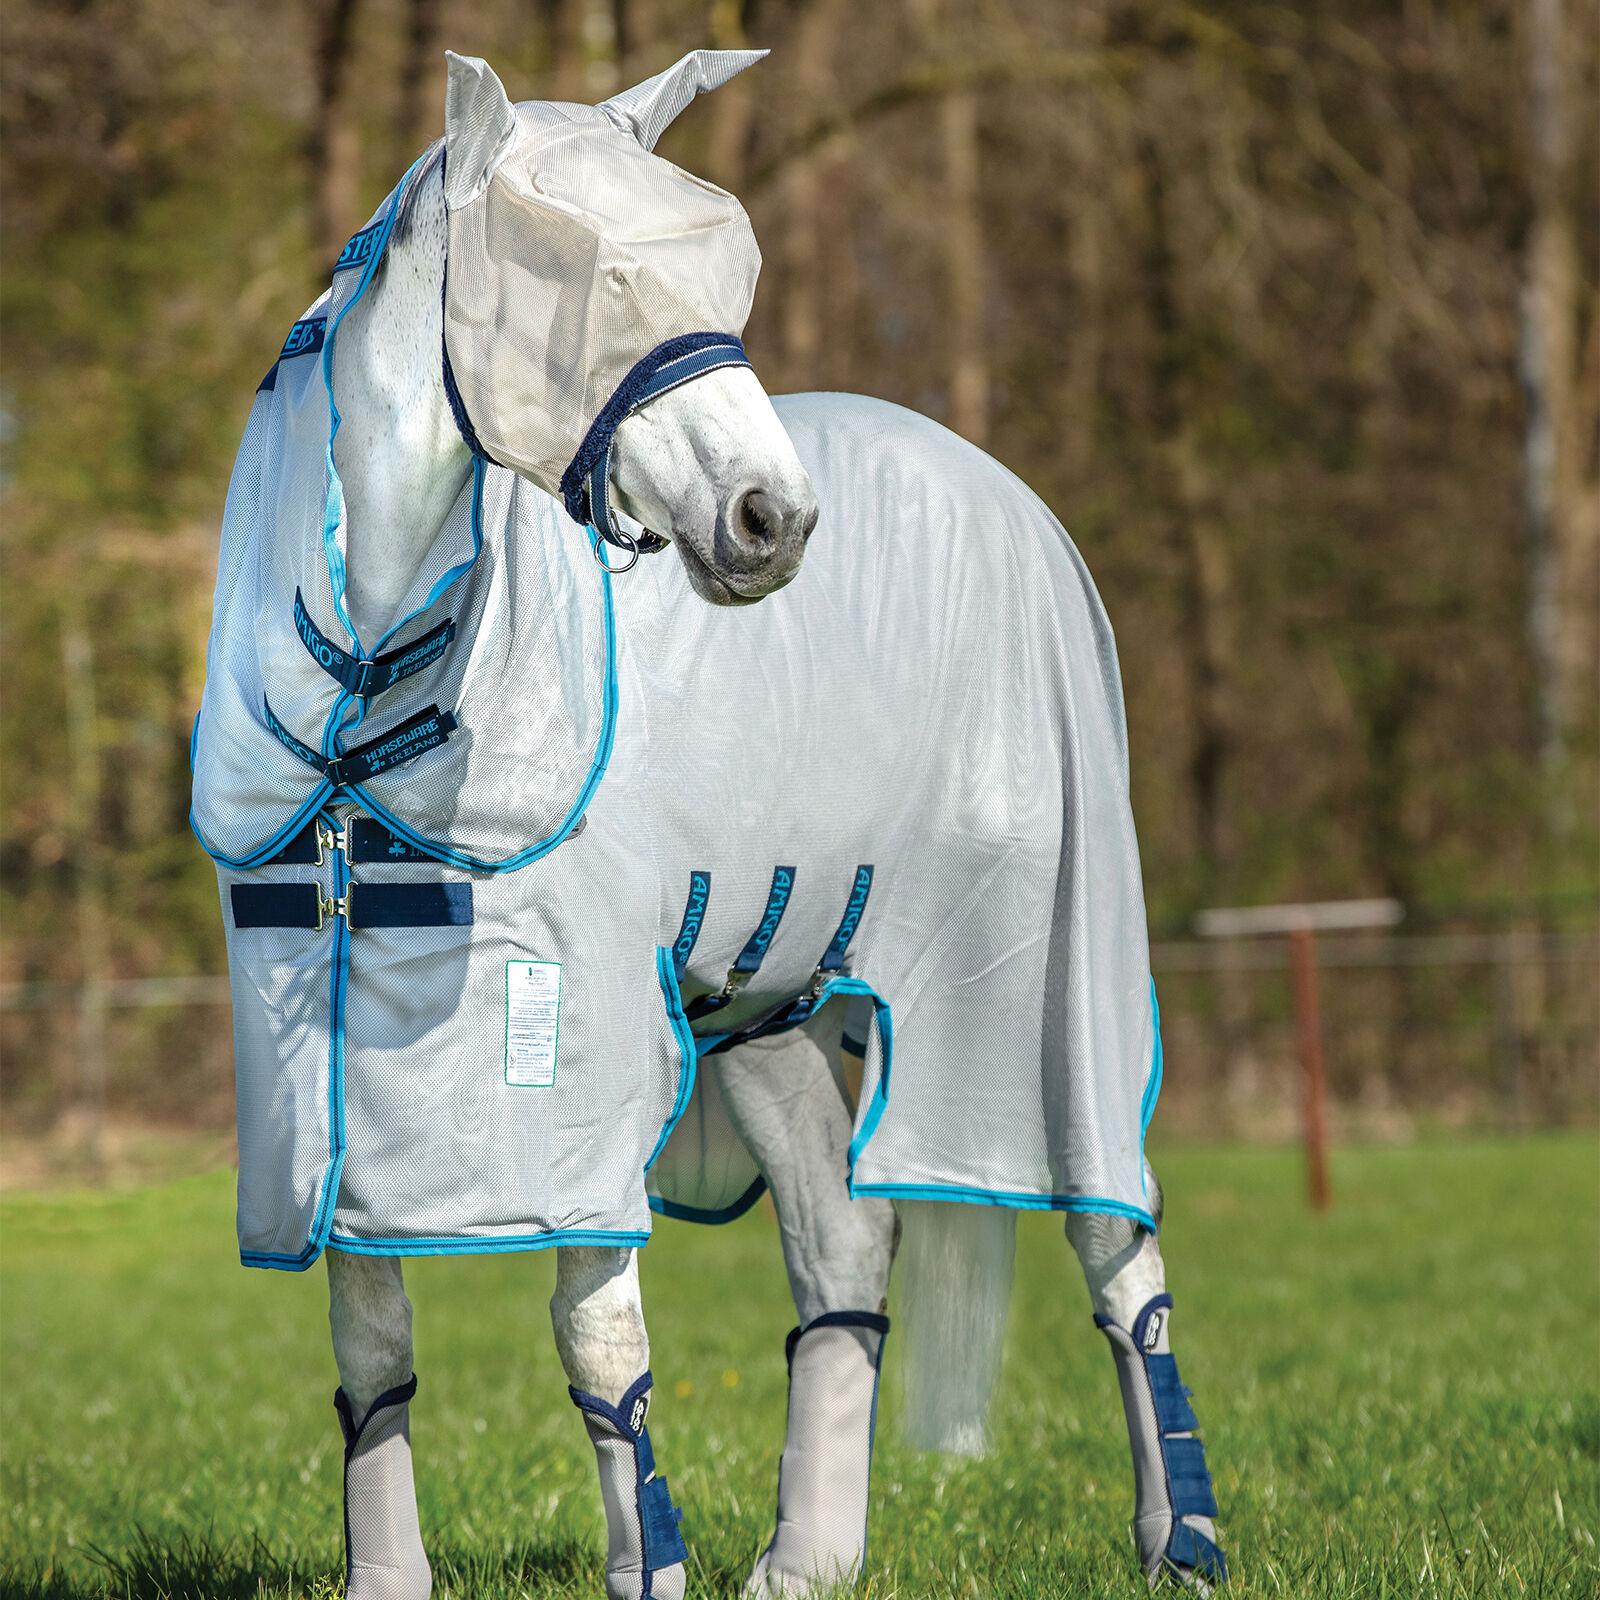 Horseware Amigo Bug Buster Vamoose New